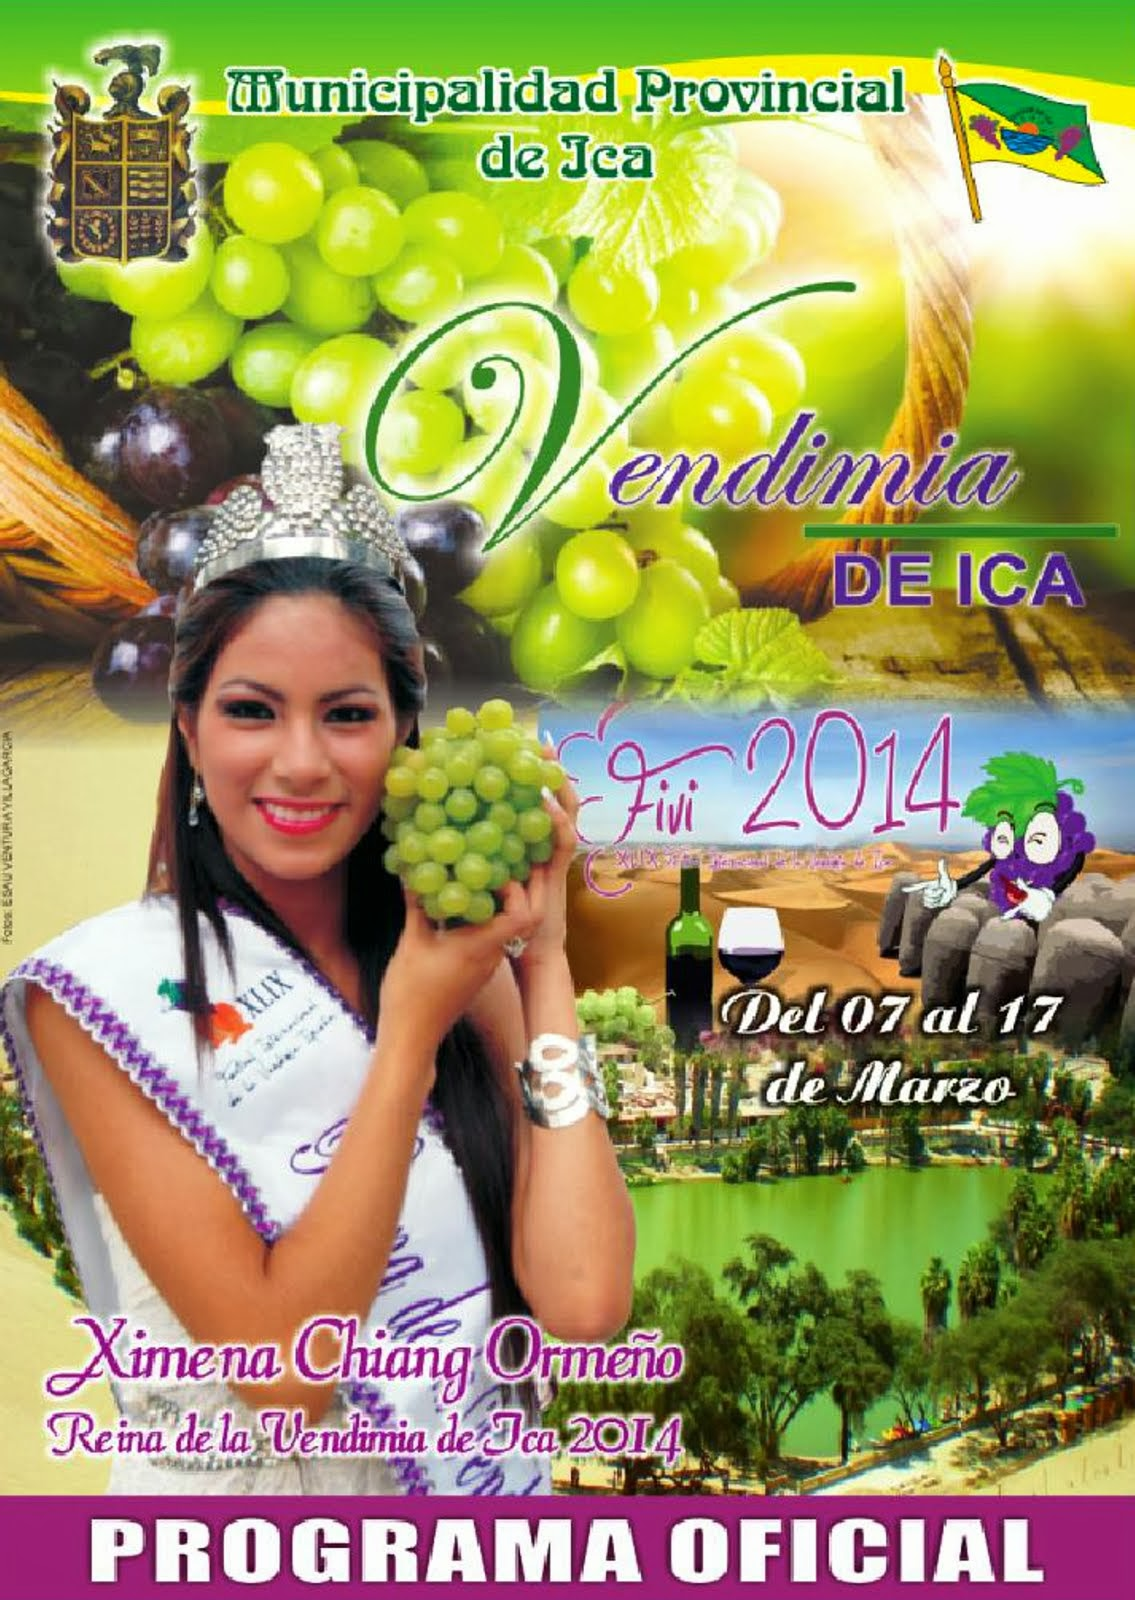 PROGRAMA OFICIAL VENDIMIA DE ICA 2014